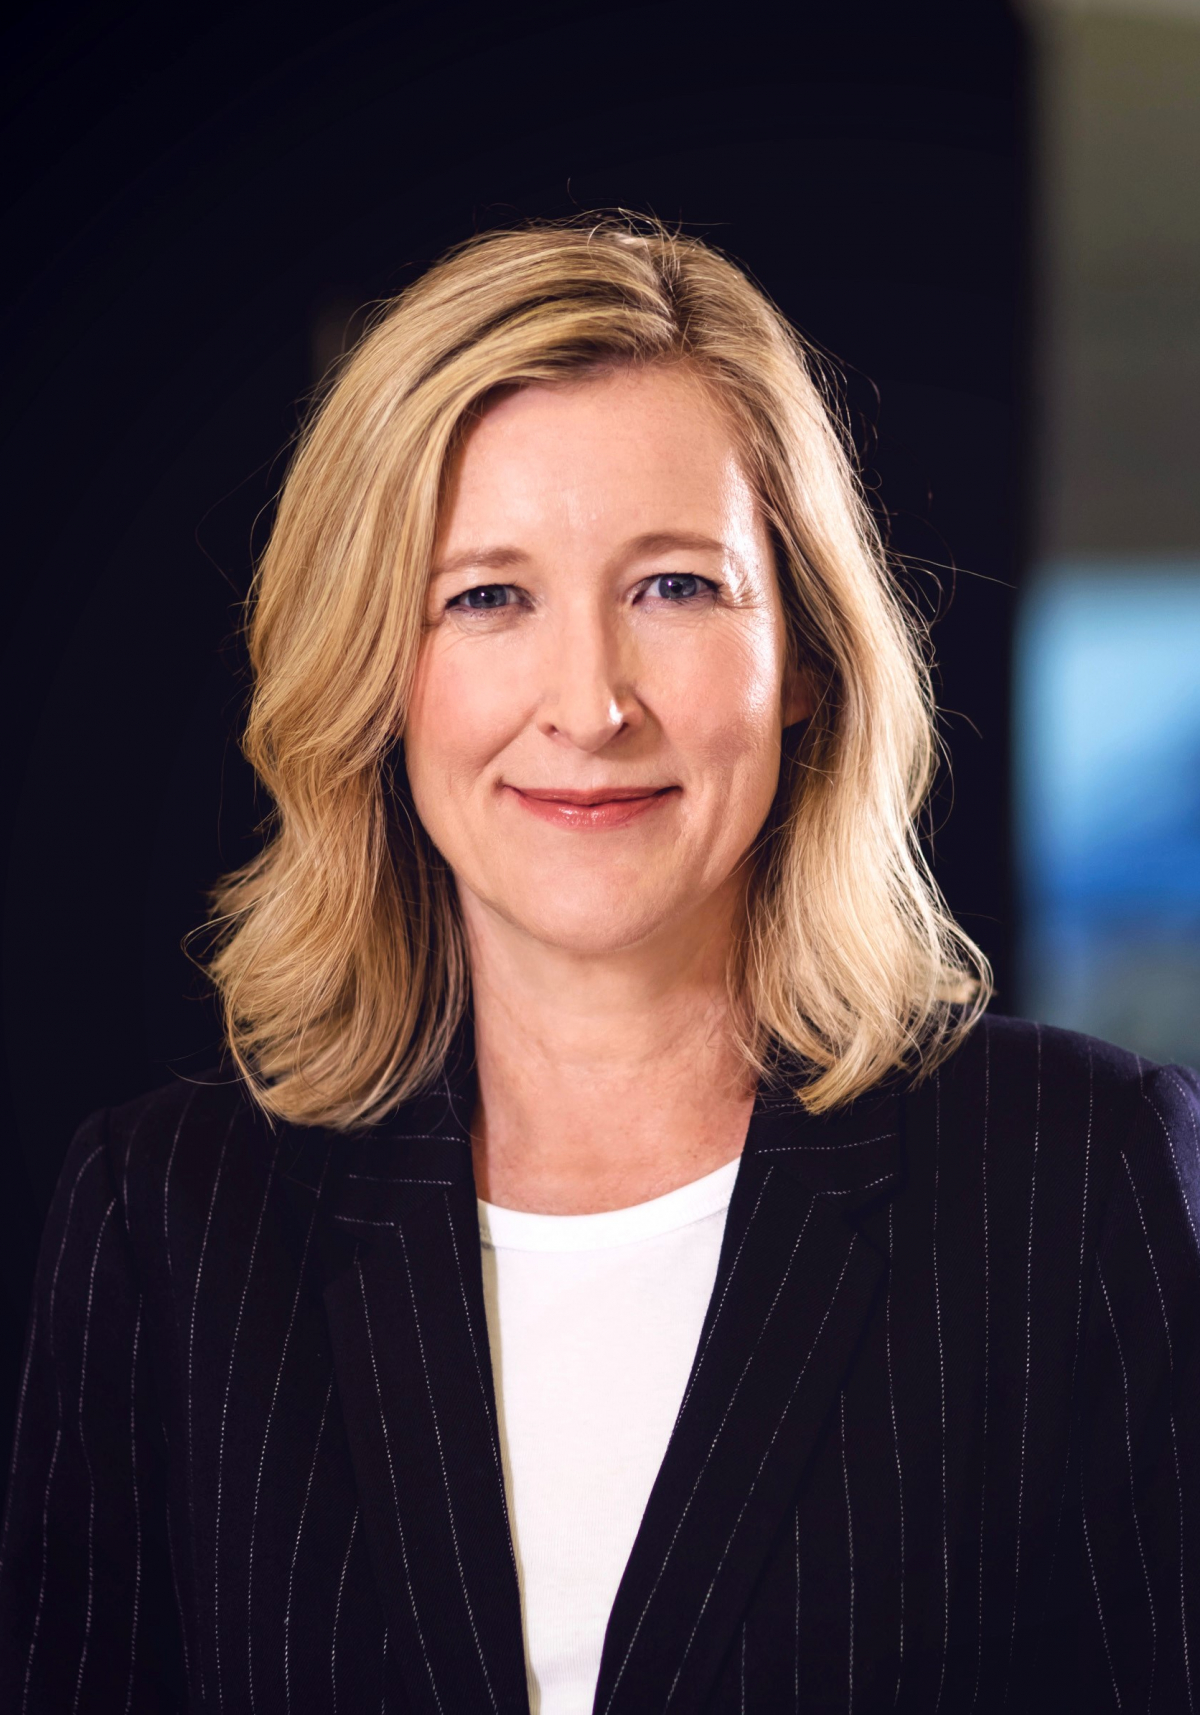 Fiona Pargeter